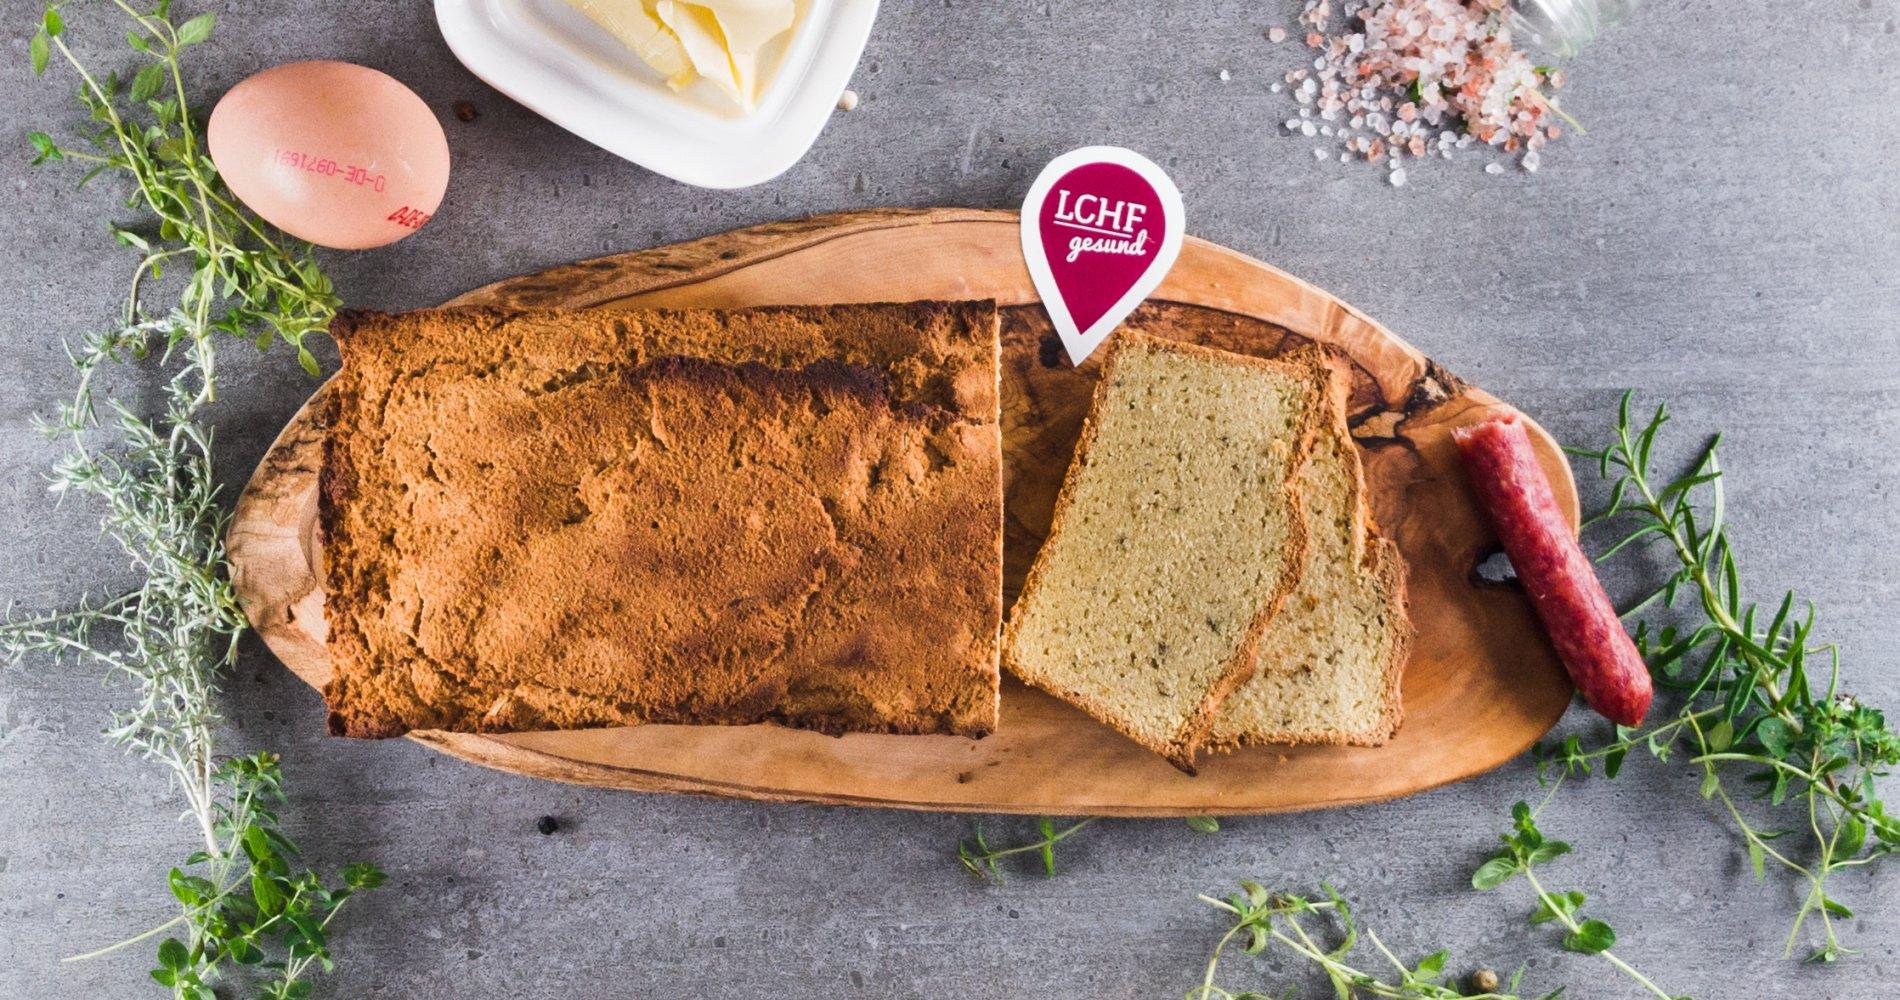 Low Carb: Kräuter-Mandel-Brot - zum Toasten, Dippen, Belegen